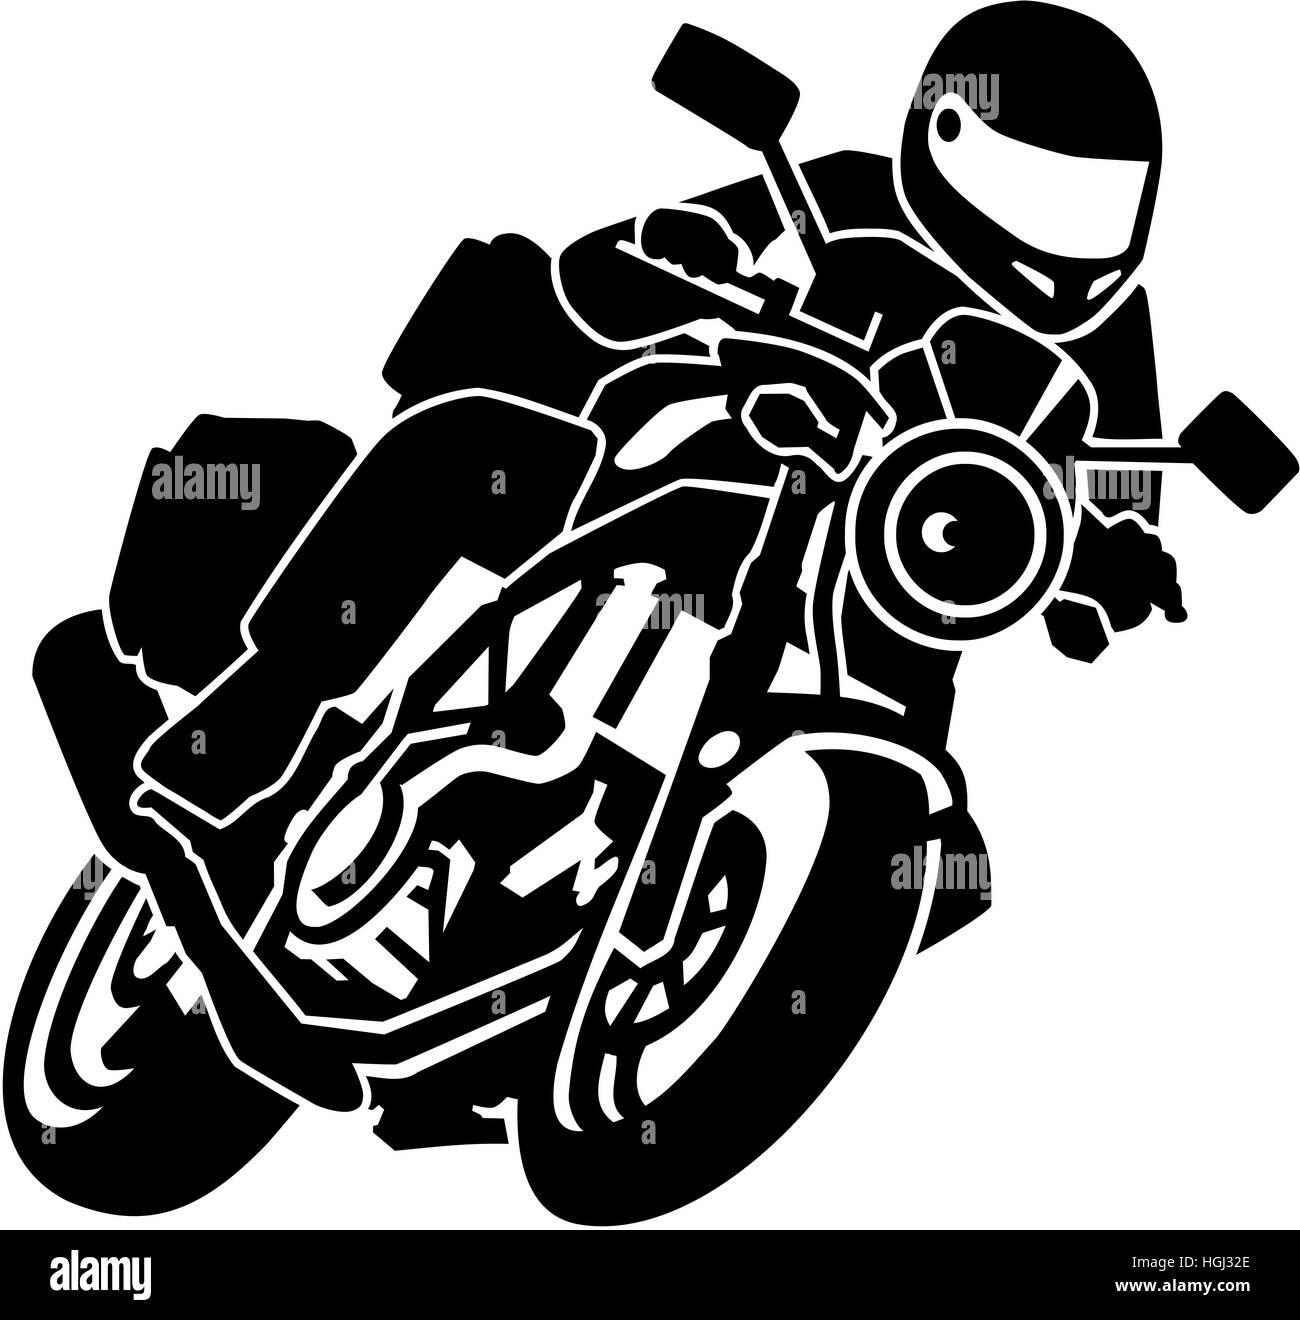 Biker on motorbike - Stock Image